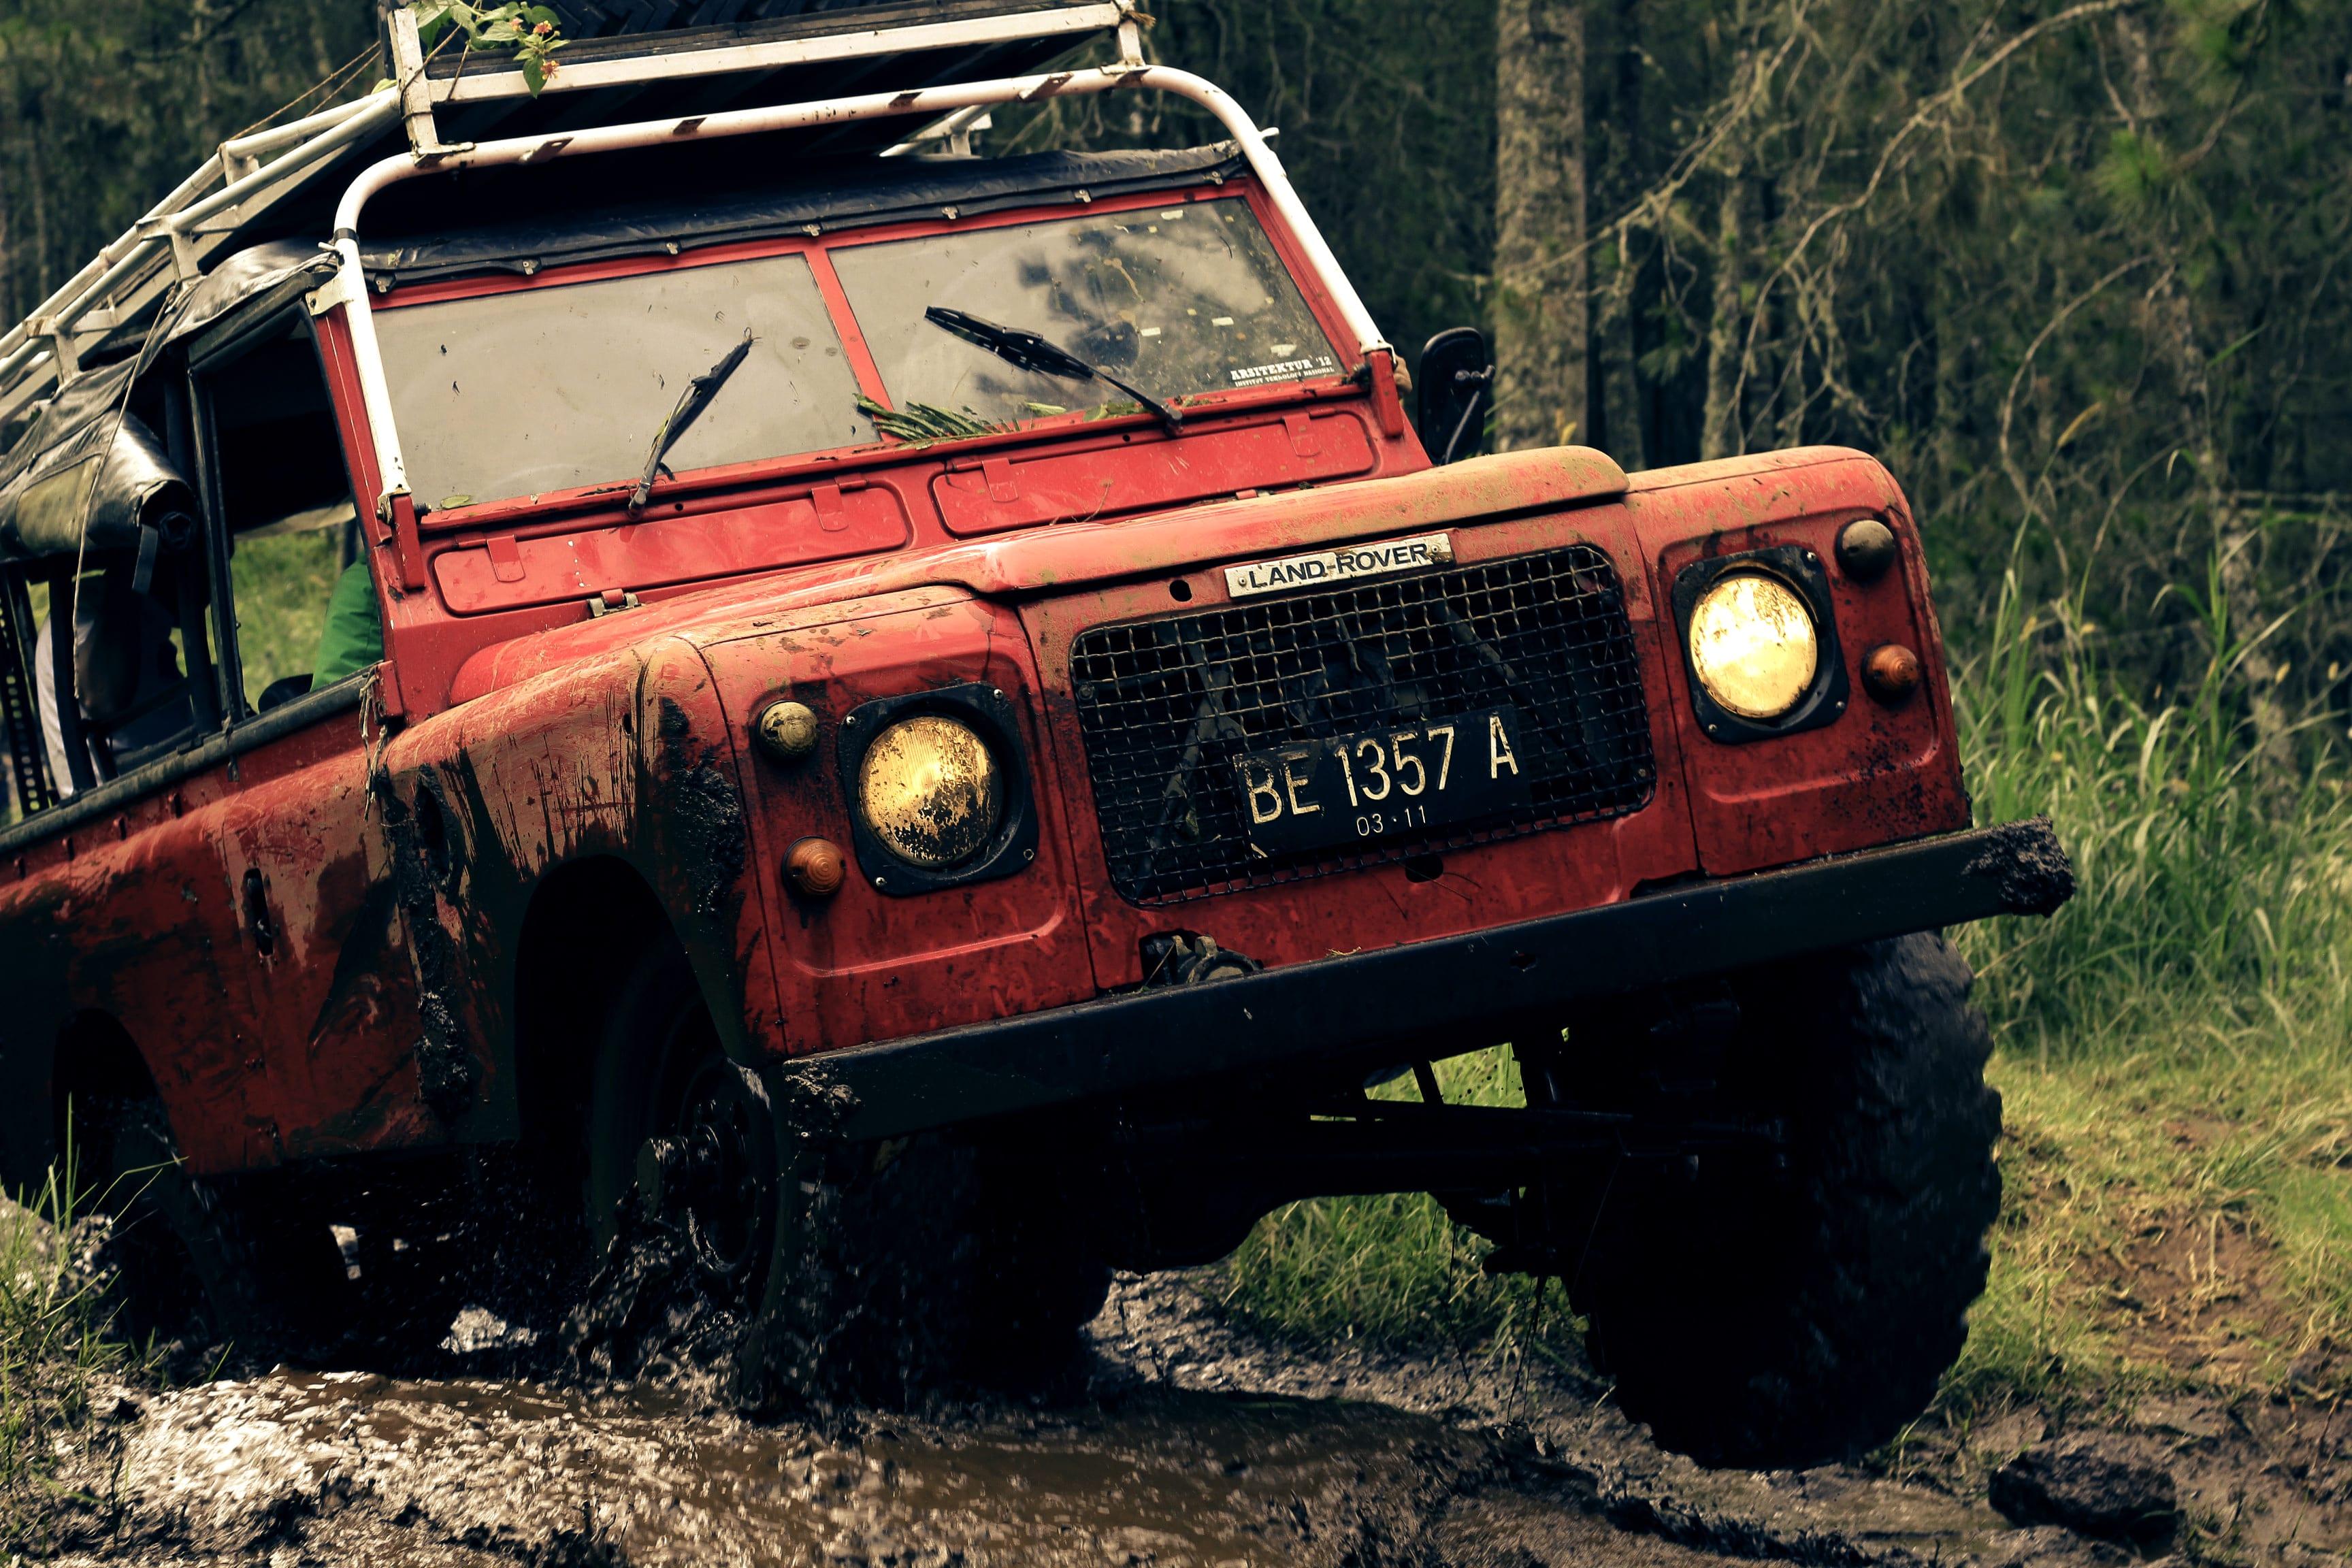 ATV Insurance | Free ATV Insurance Quotes Online | EINSURANCE